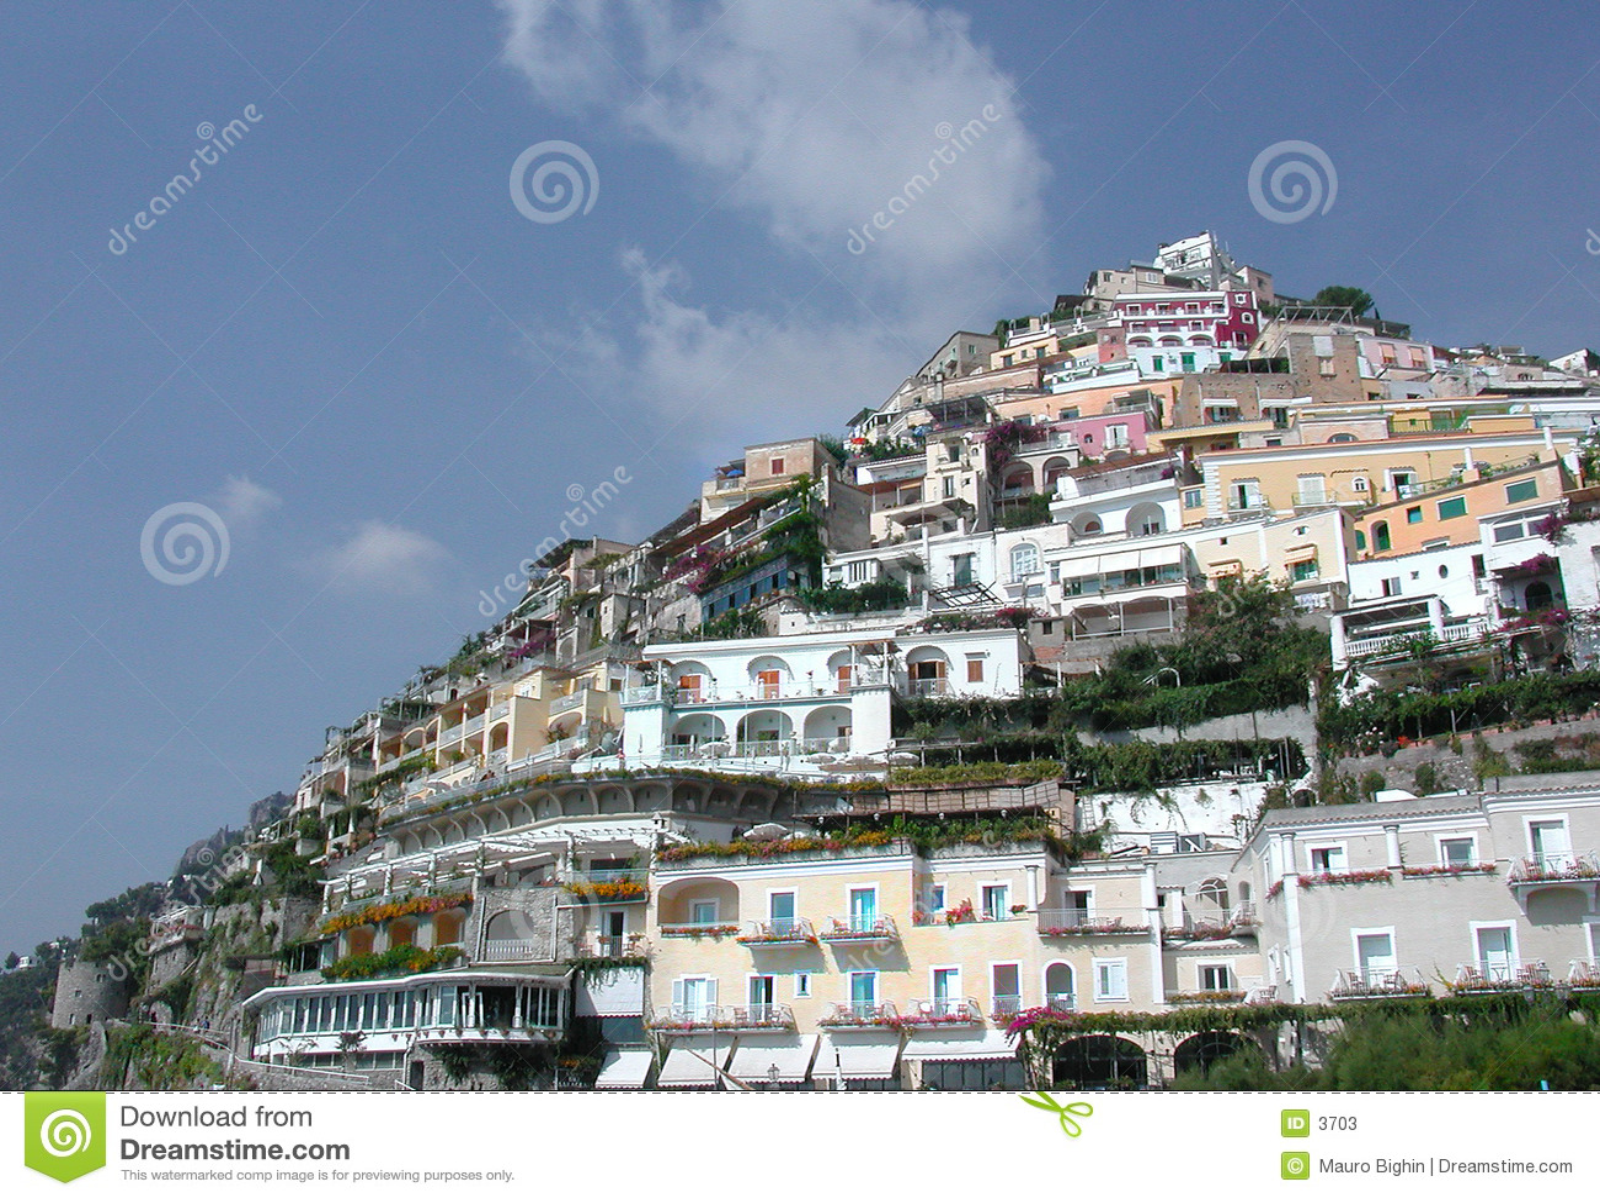 Positano, Naples, Italy